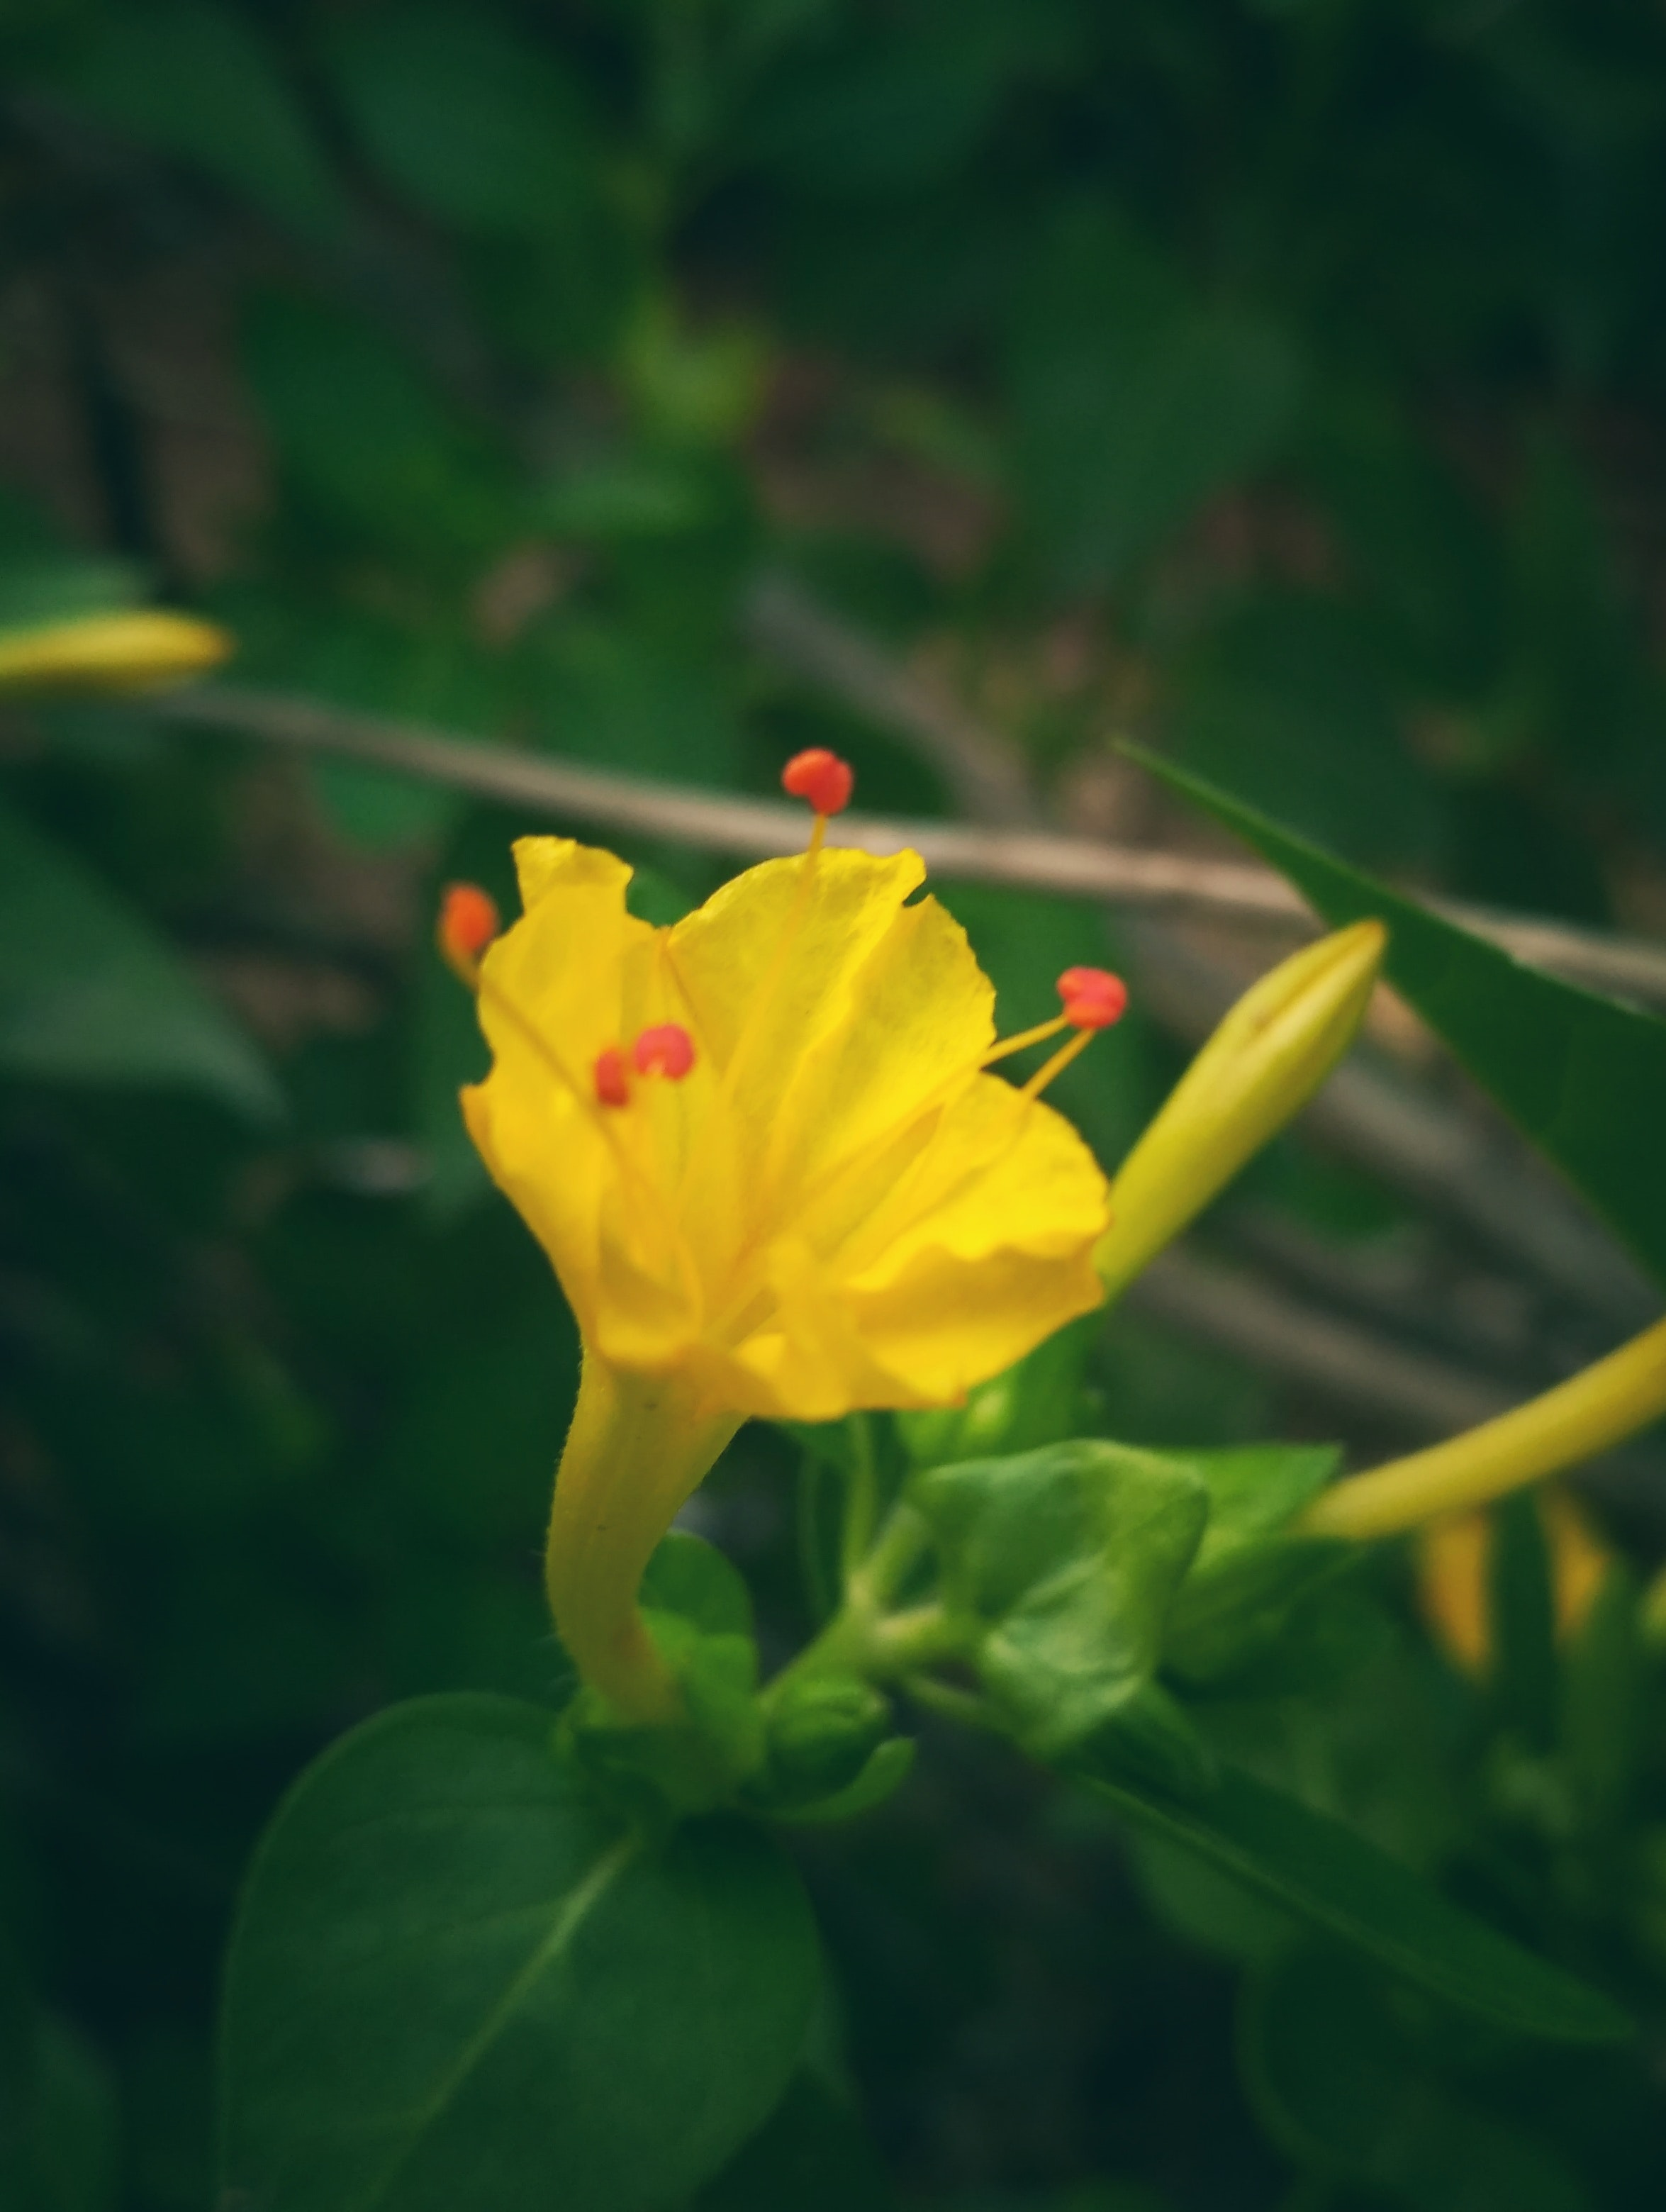 Free stock photo of dark green green leaf yellow flower mightylinksfo